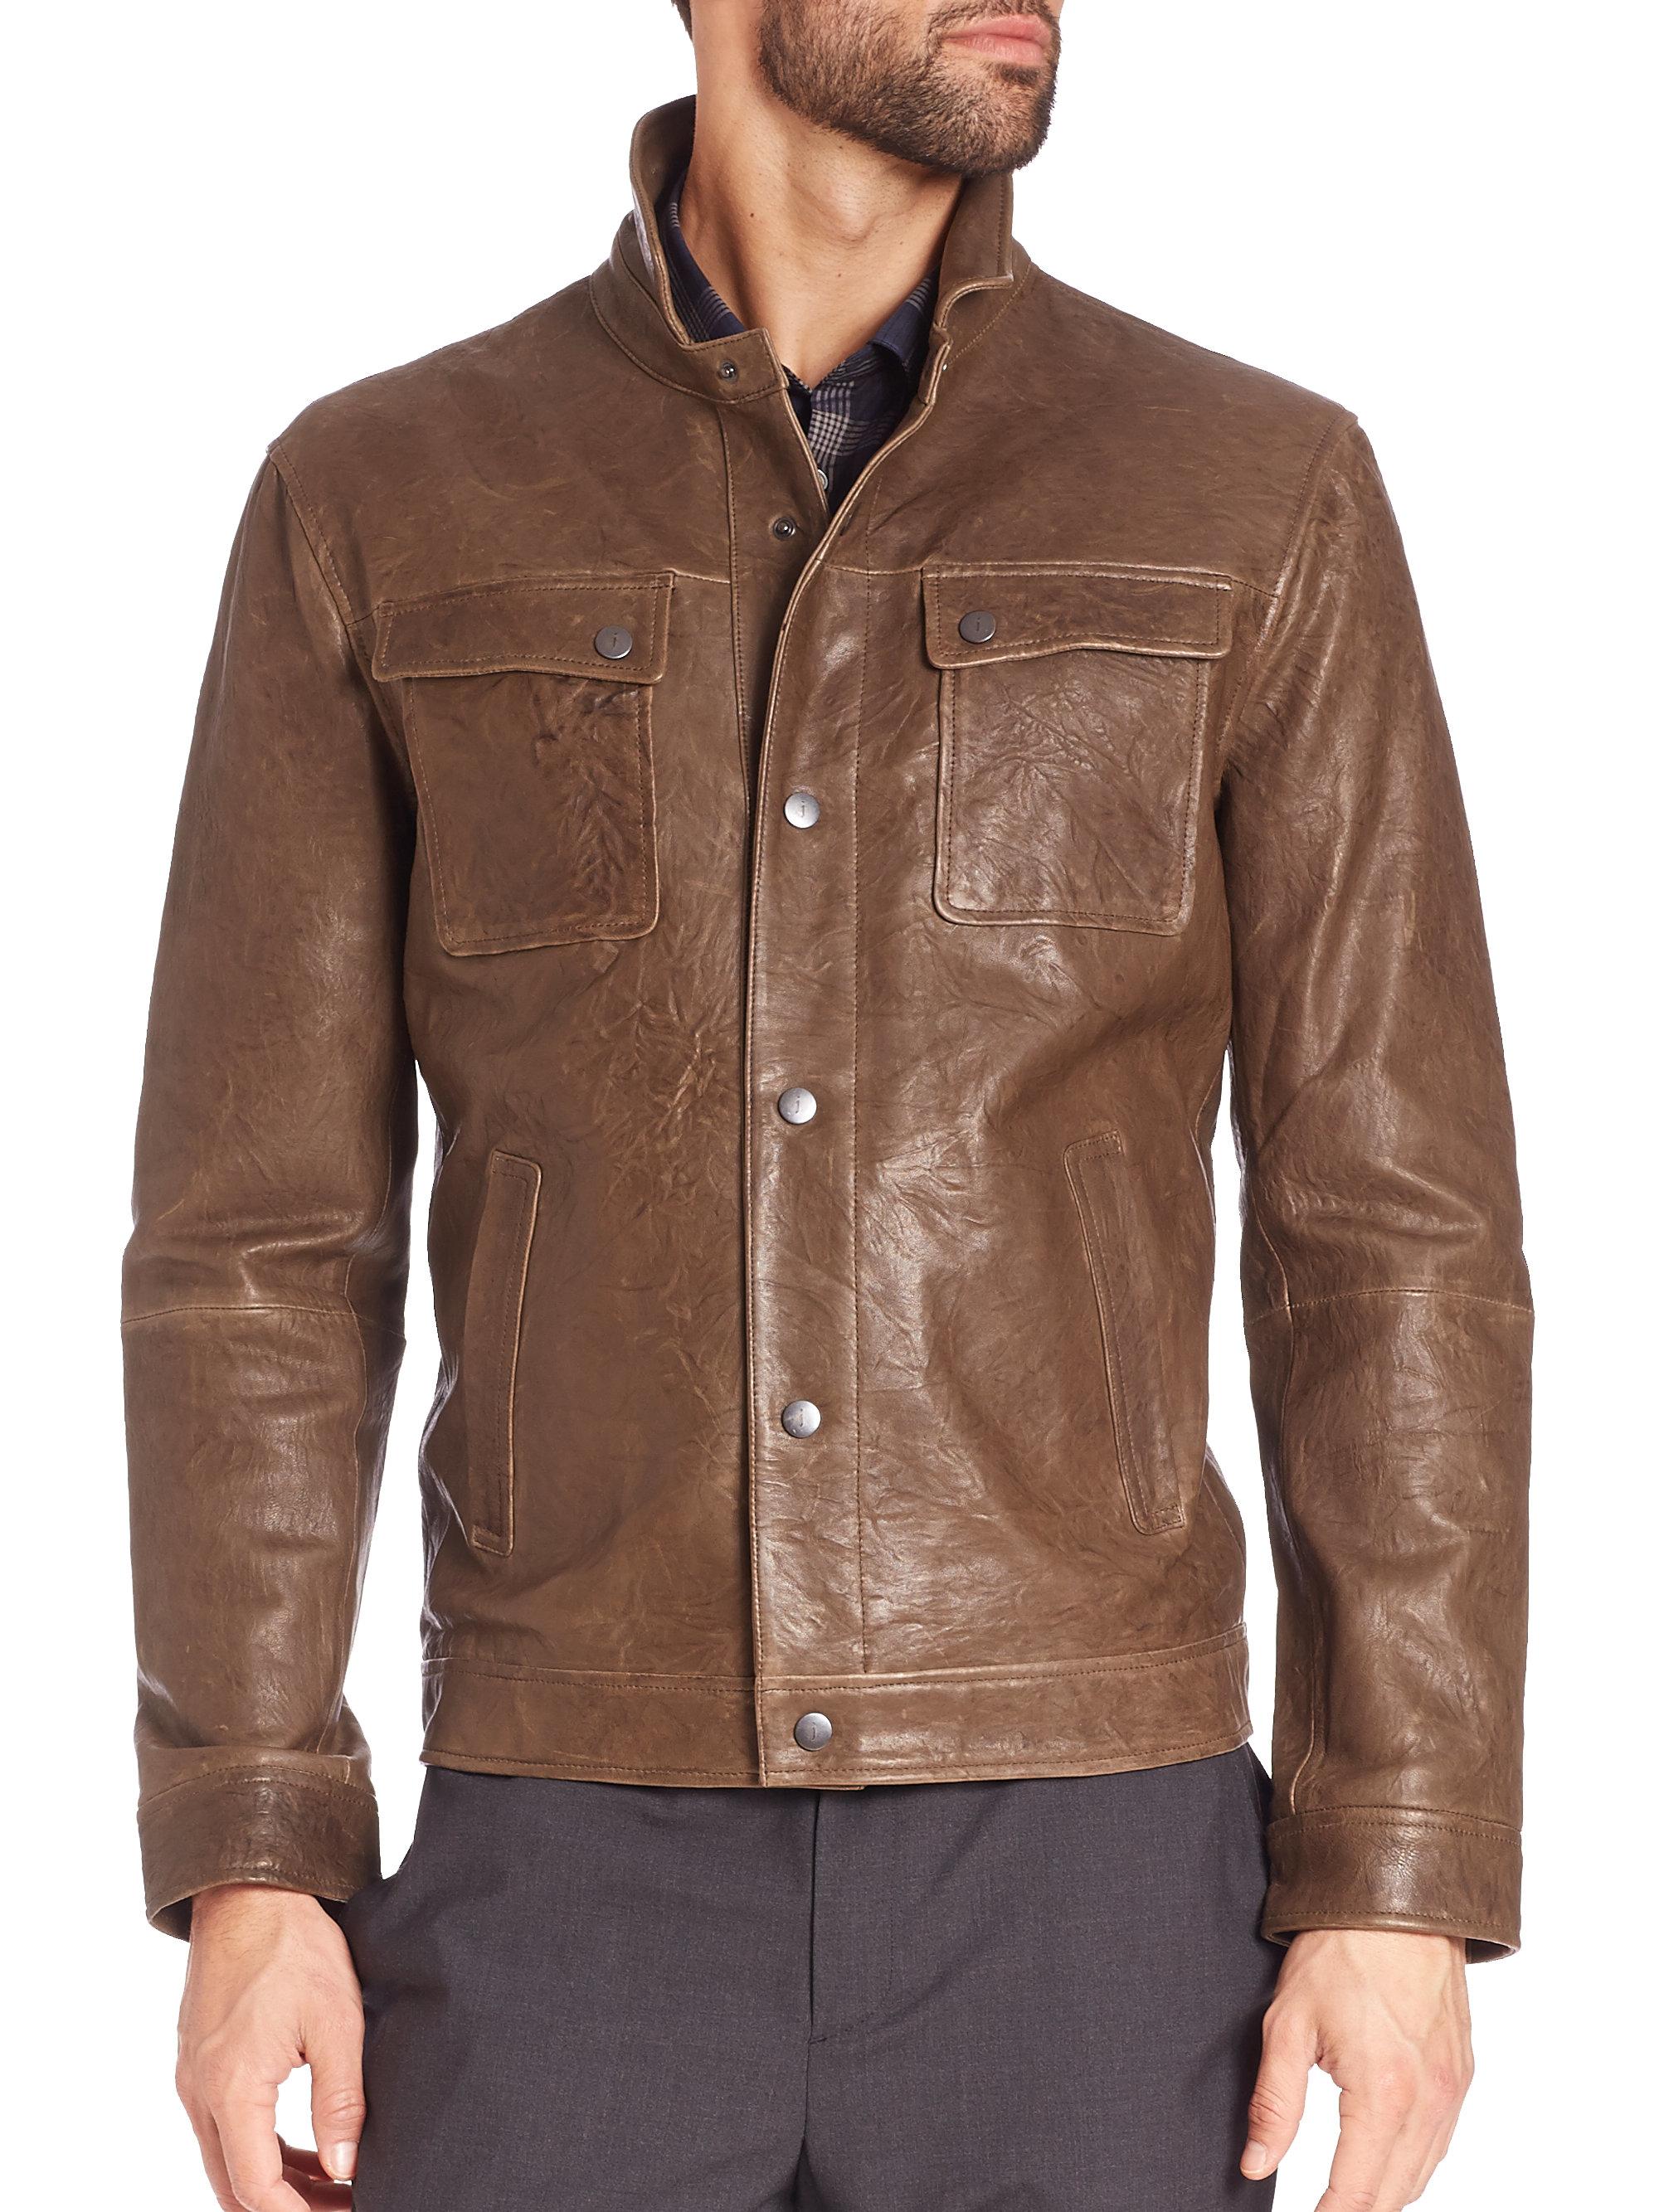 Buy john varvatos leather jacket